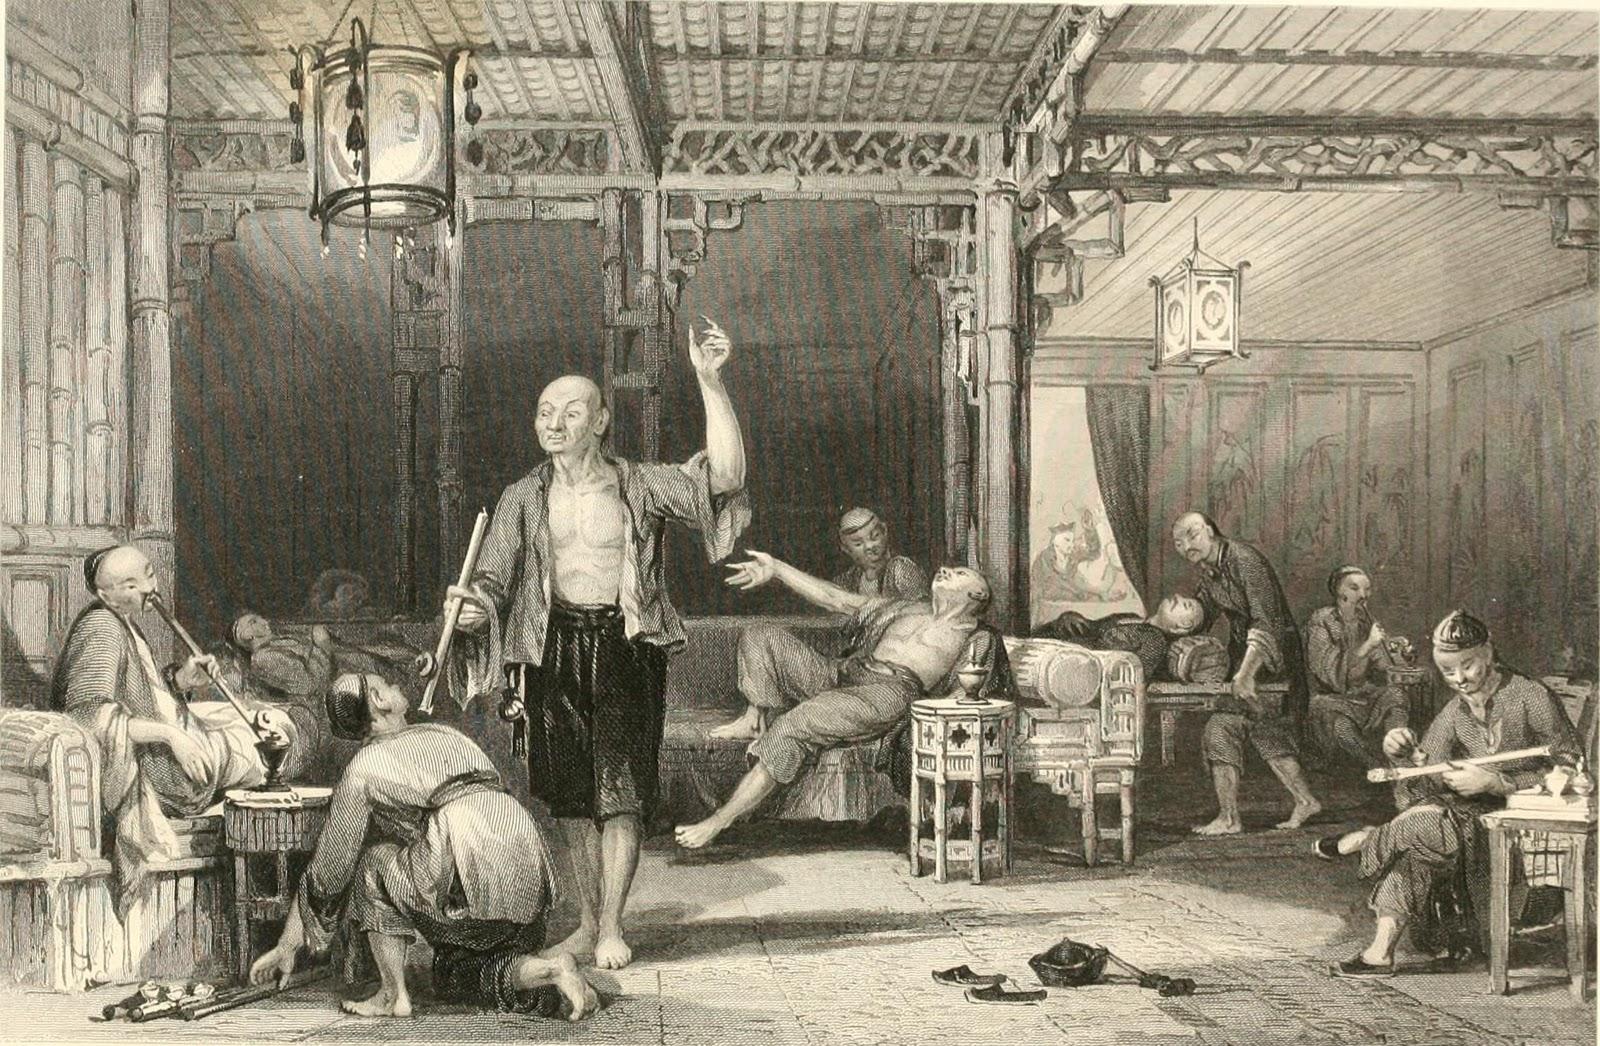 Viático de Vagamundo: First opium war 1839-1842 (Primeira guerra do ópio)